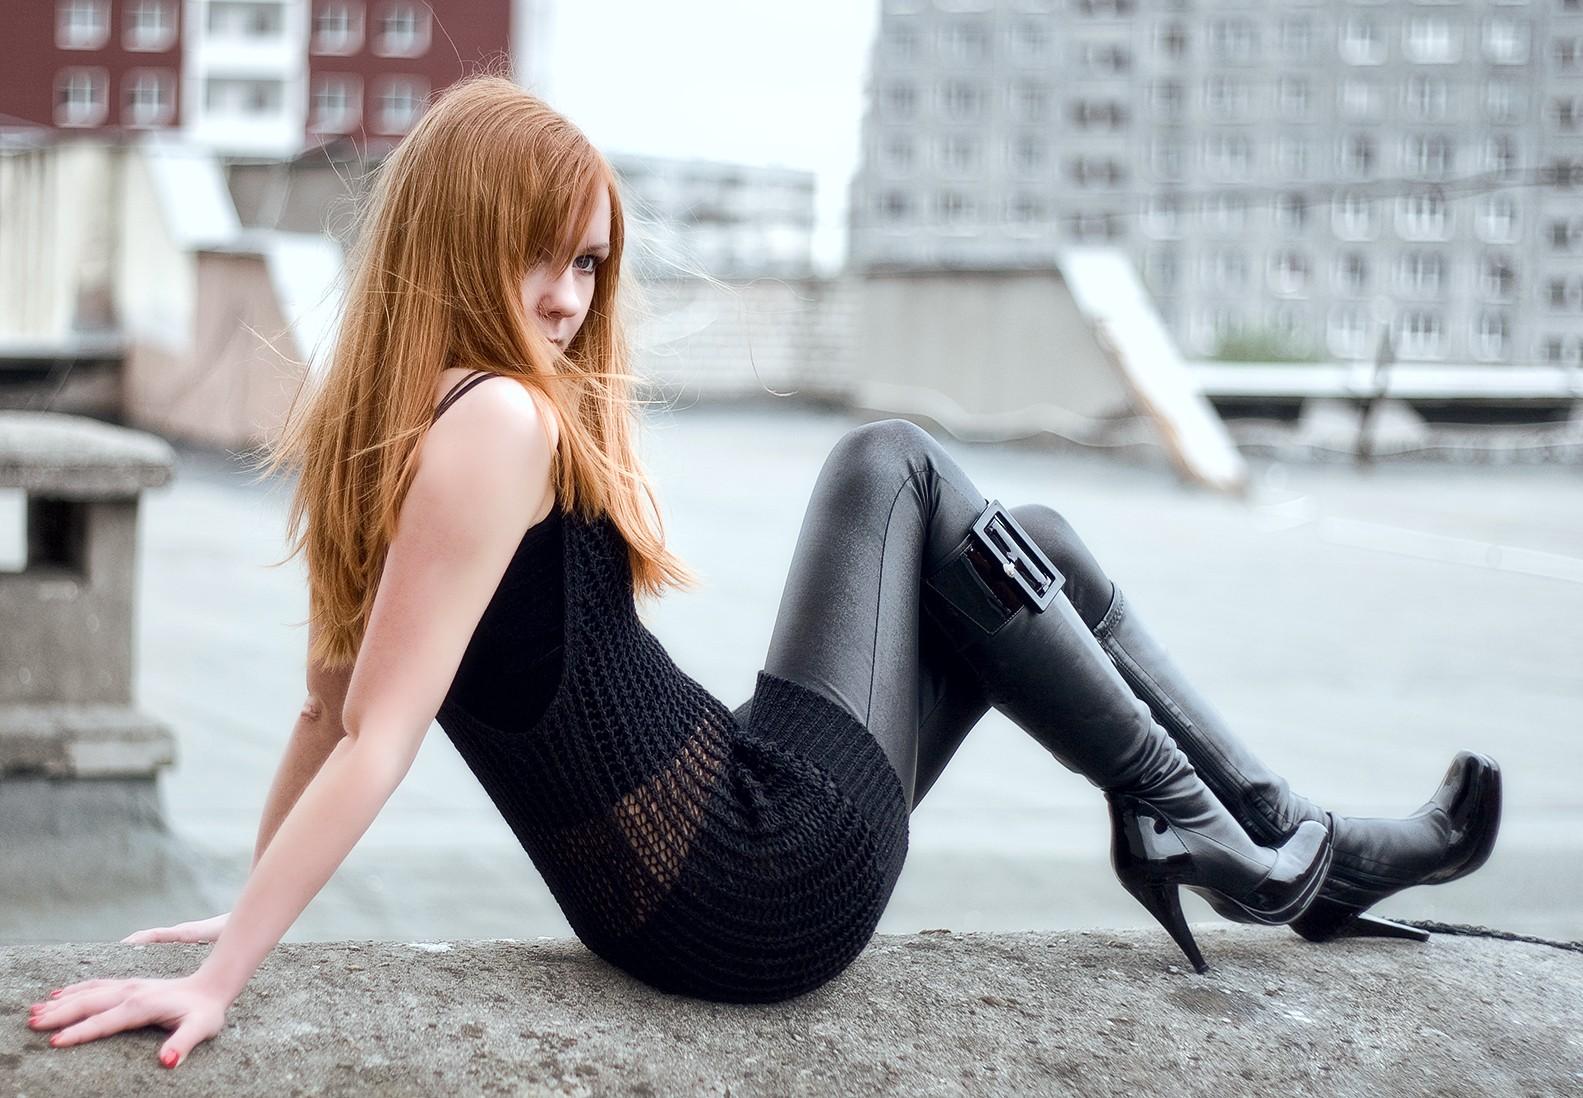 Wallpaper  Women Outdoors, Redhead, Street, Long Hair, Urban, Black Clothing, Sitting -2985